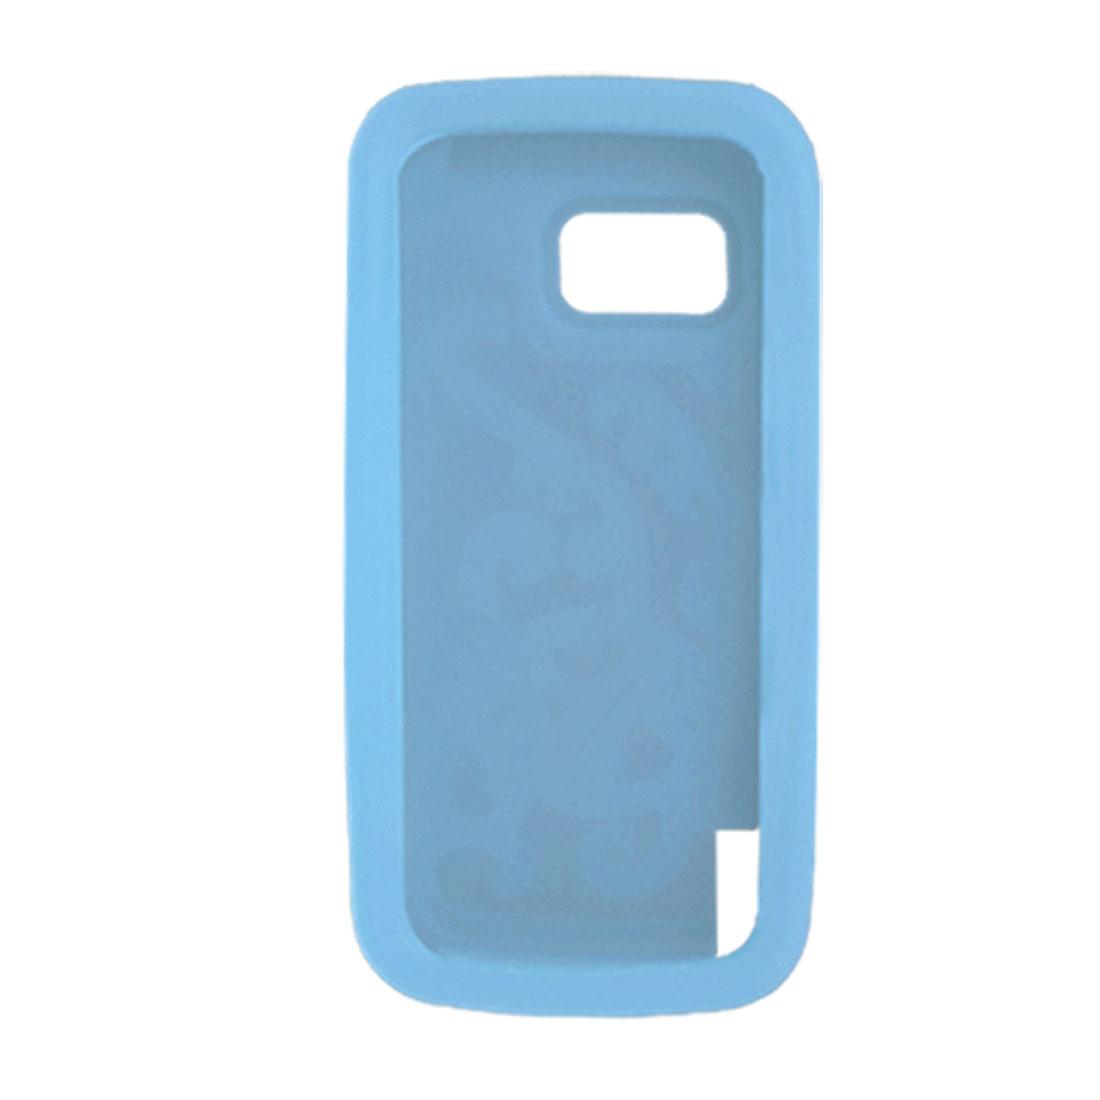 Anti-Scratch Soft Silicone Skin Case Cover for Nokia 5800